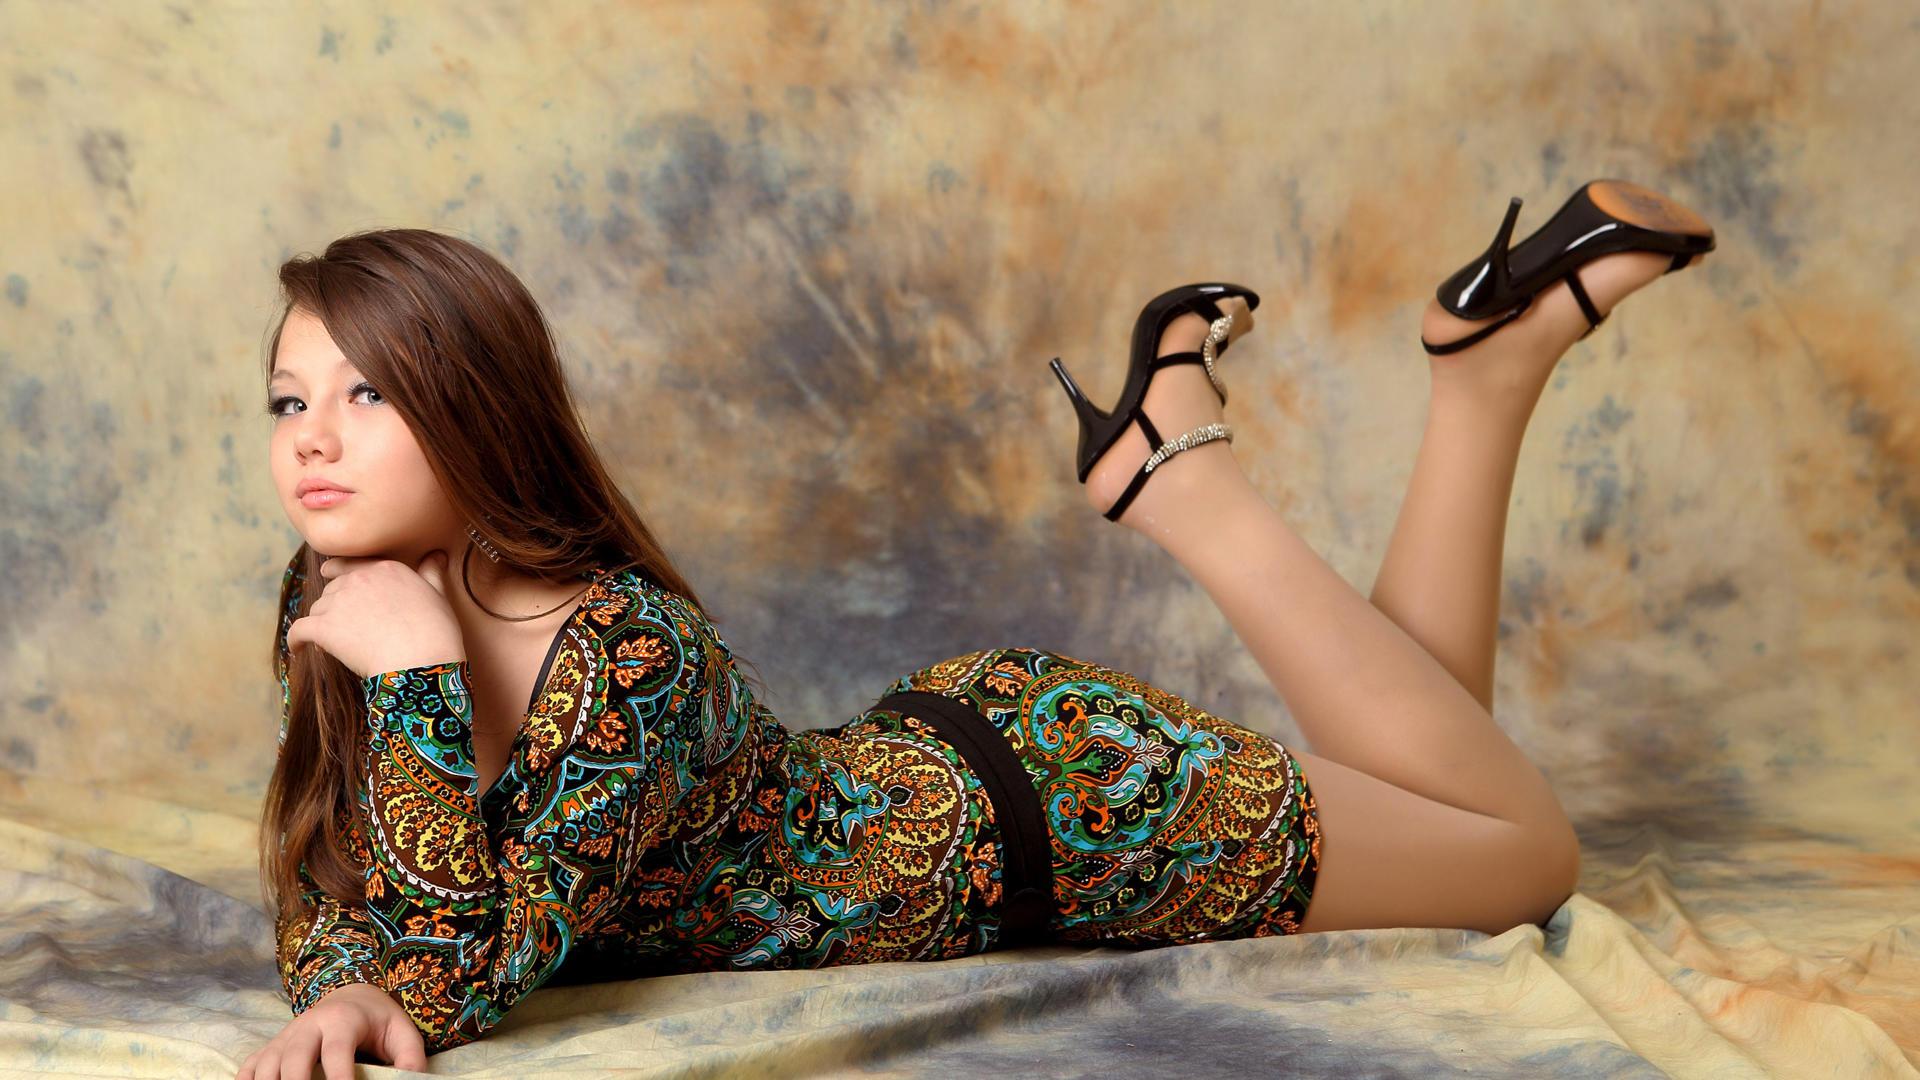 Download photo 1920x1080, kleofia, brunette, sexy girl